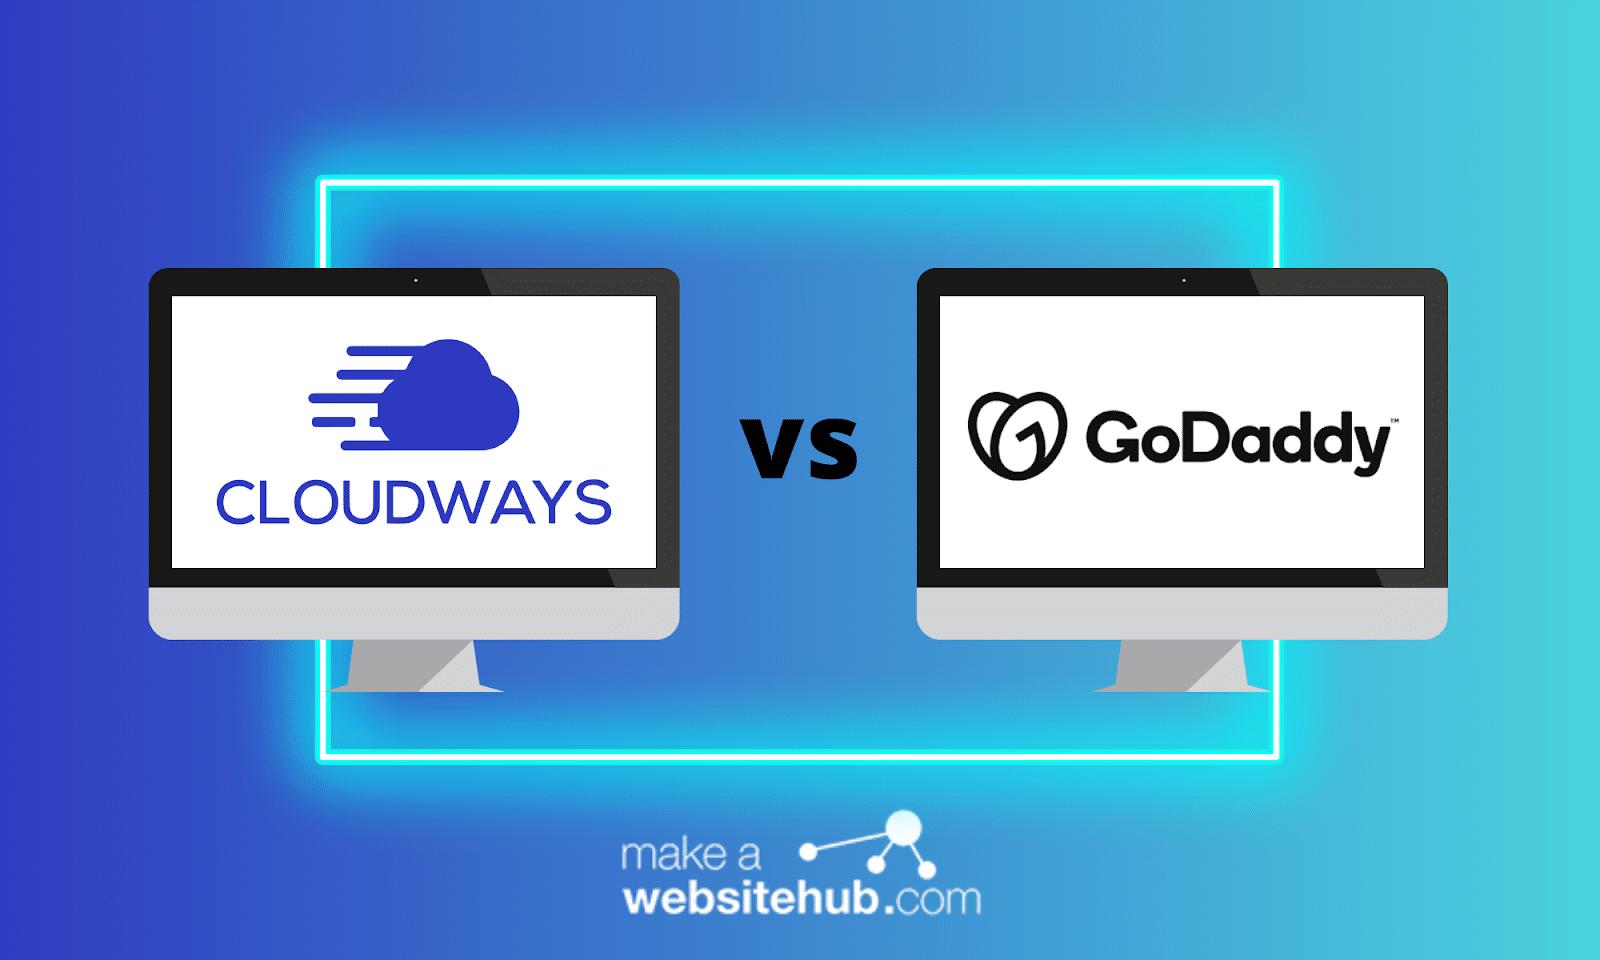 cloudways vs godaddy header image